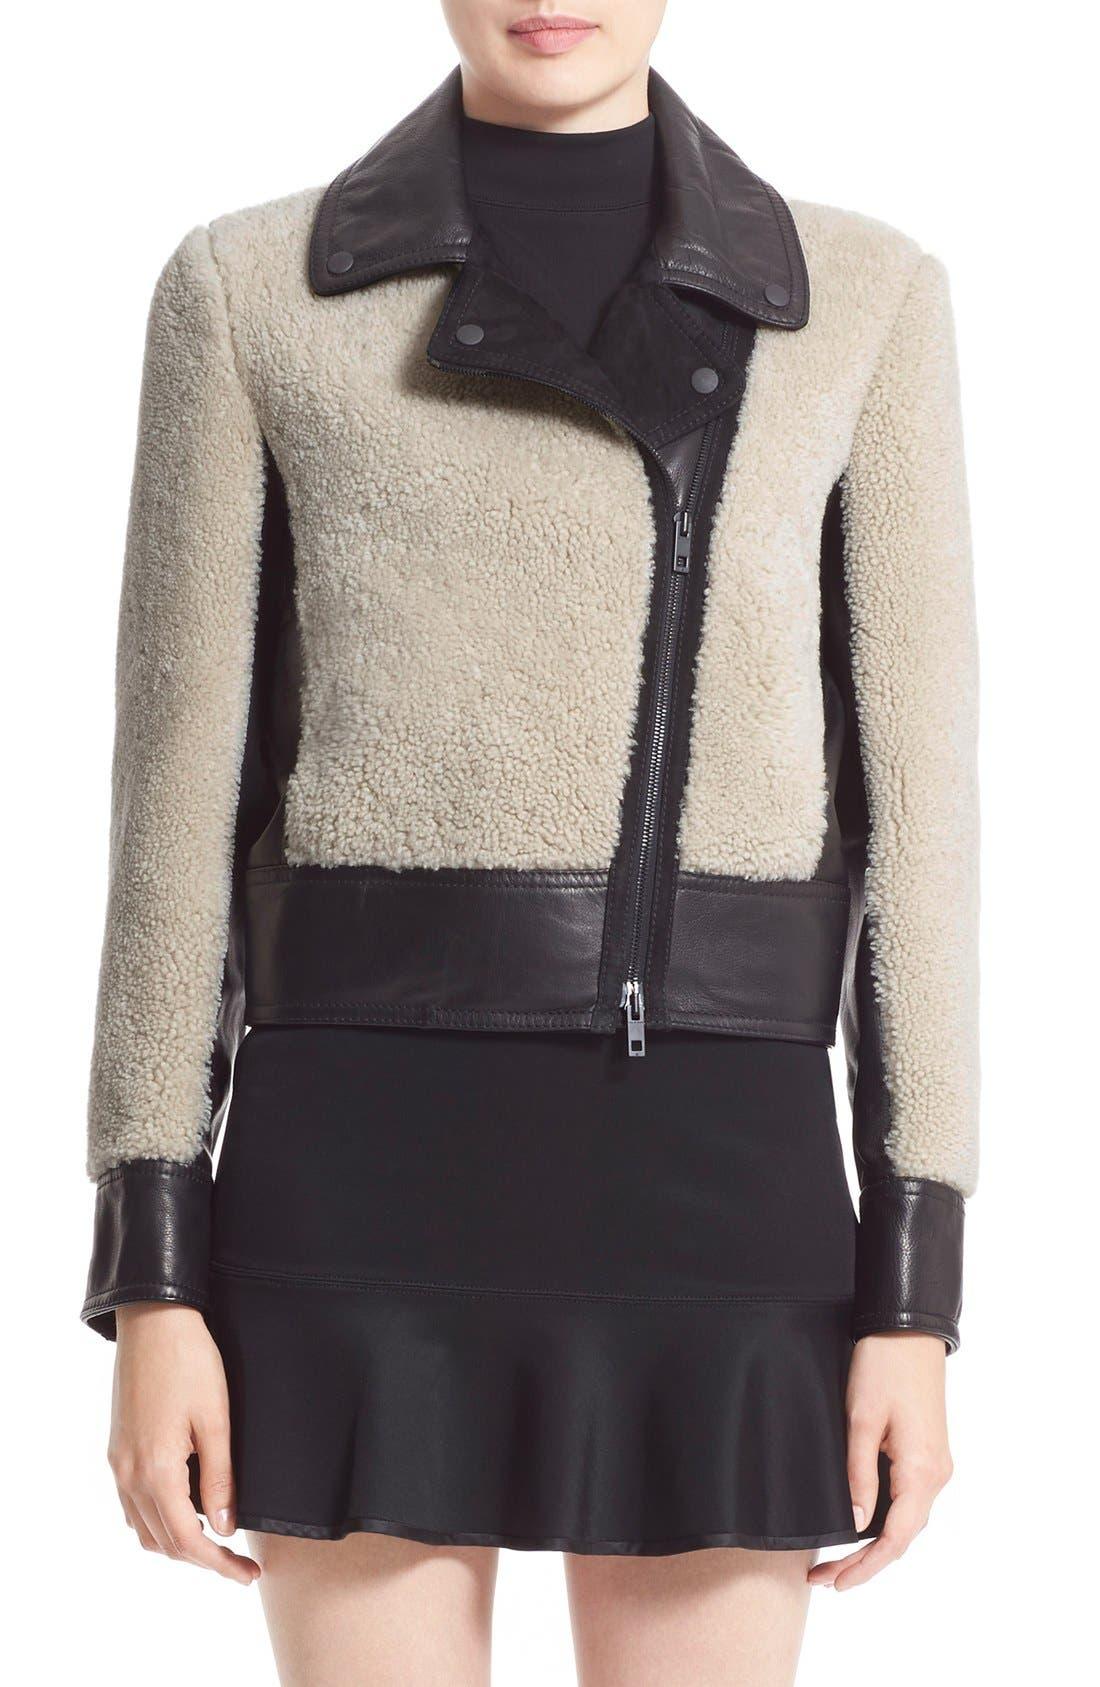 Main Image - rag & bone 'Billie' Leather TrimGenuine Shearling Jacket